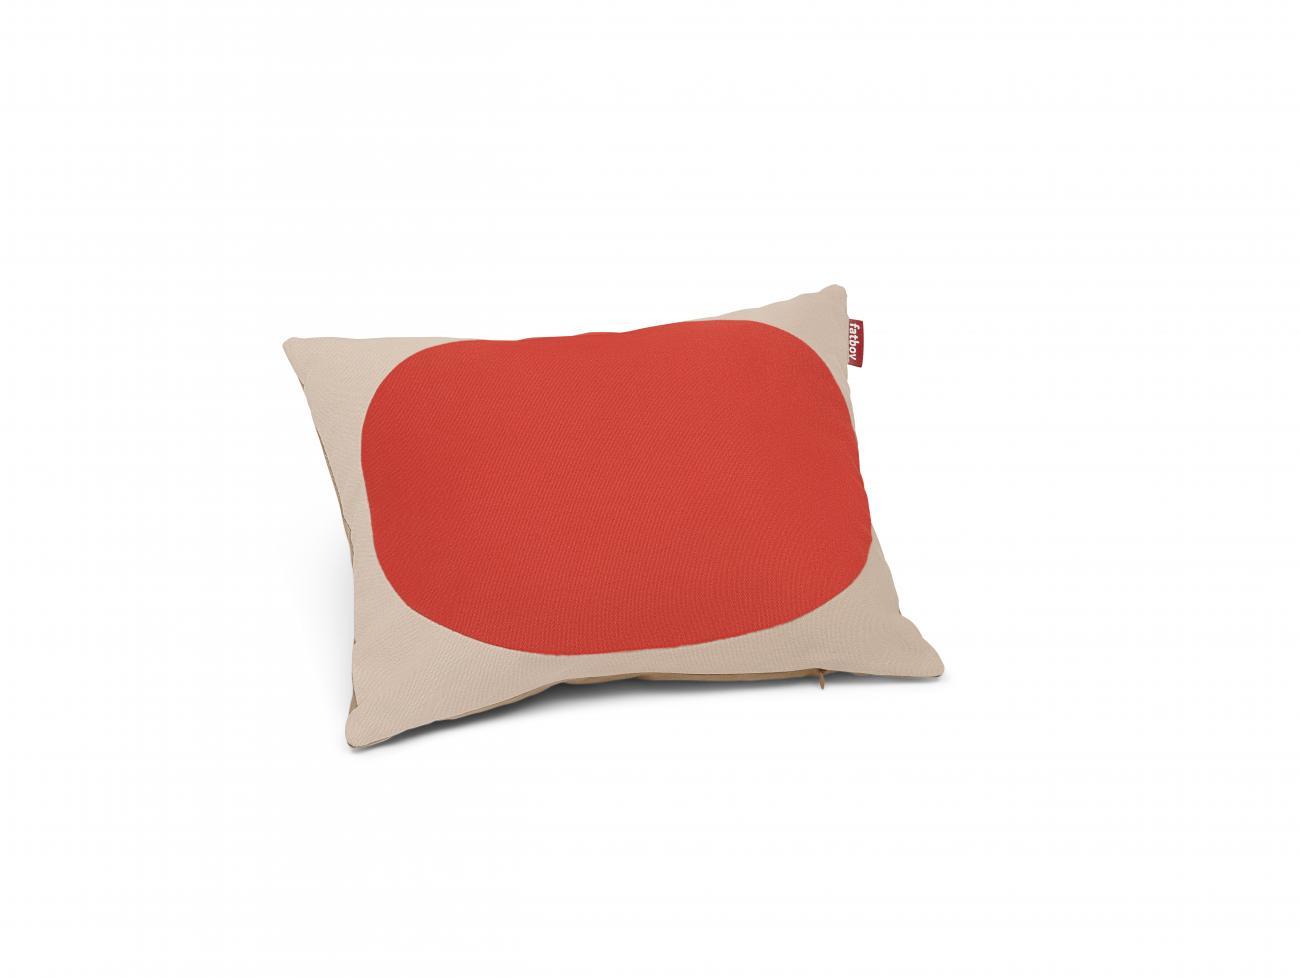 https://www.fundesign.nl/media/catalog/product/f/a/fatboy_pop-pillow_poppy_front_srgb.jpg